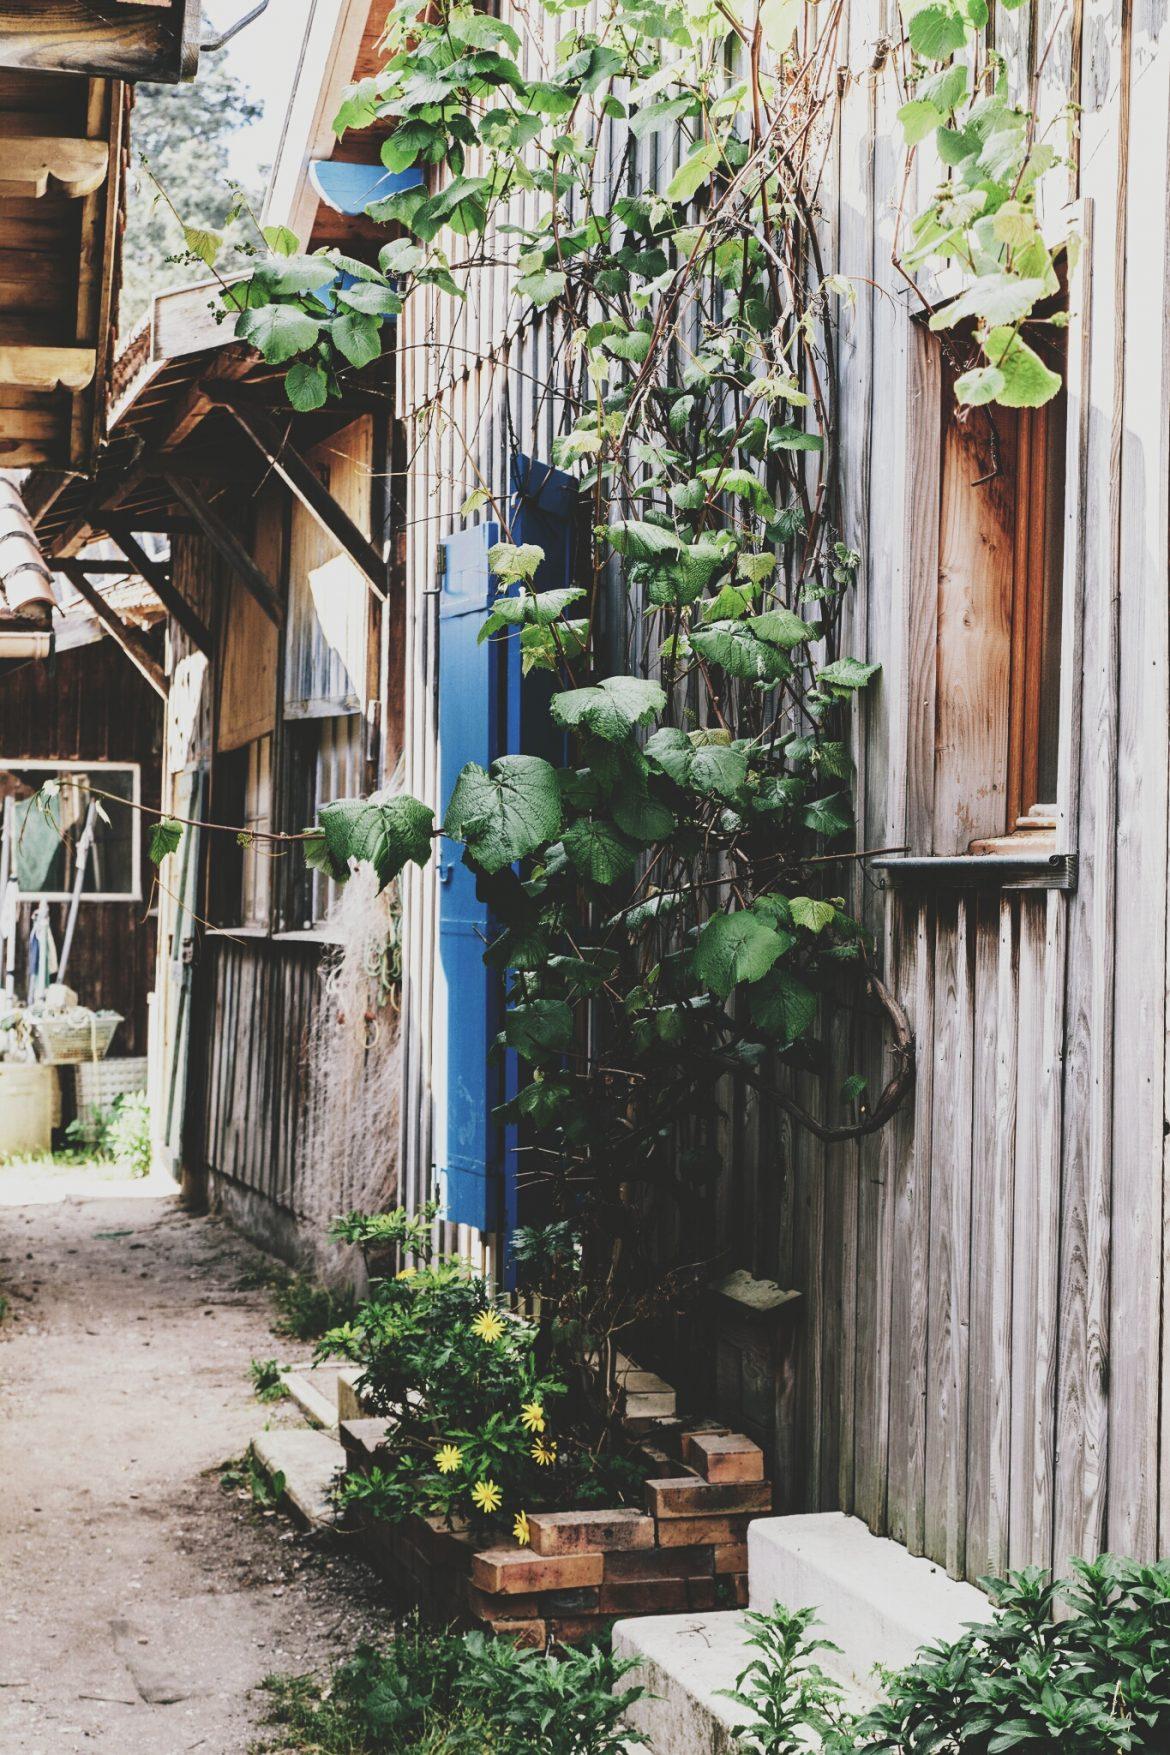 Visiter le village de l'Herbe - Cap Ferret